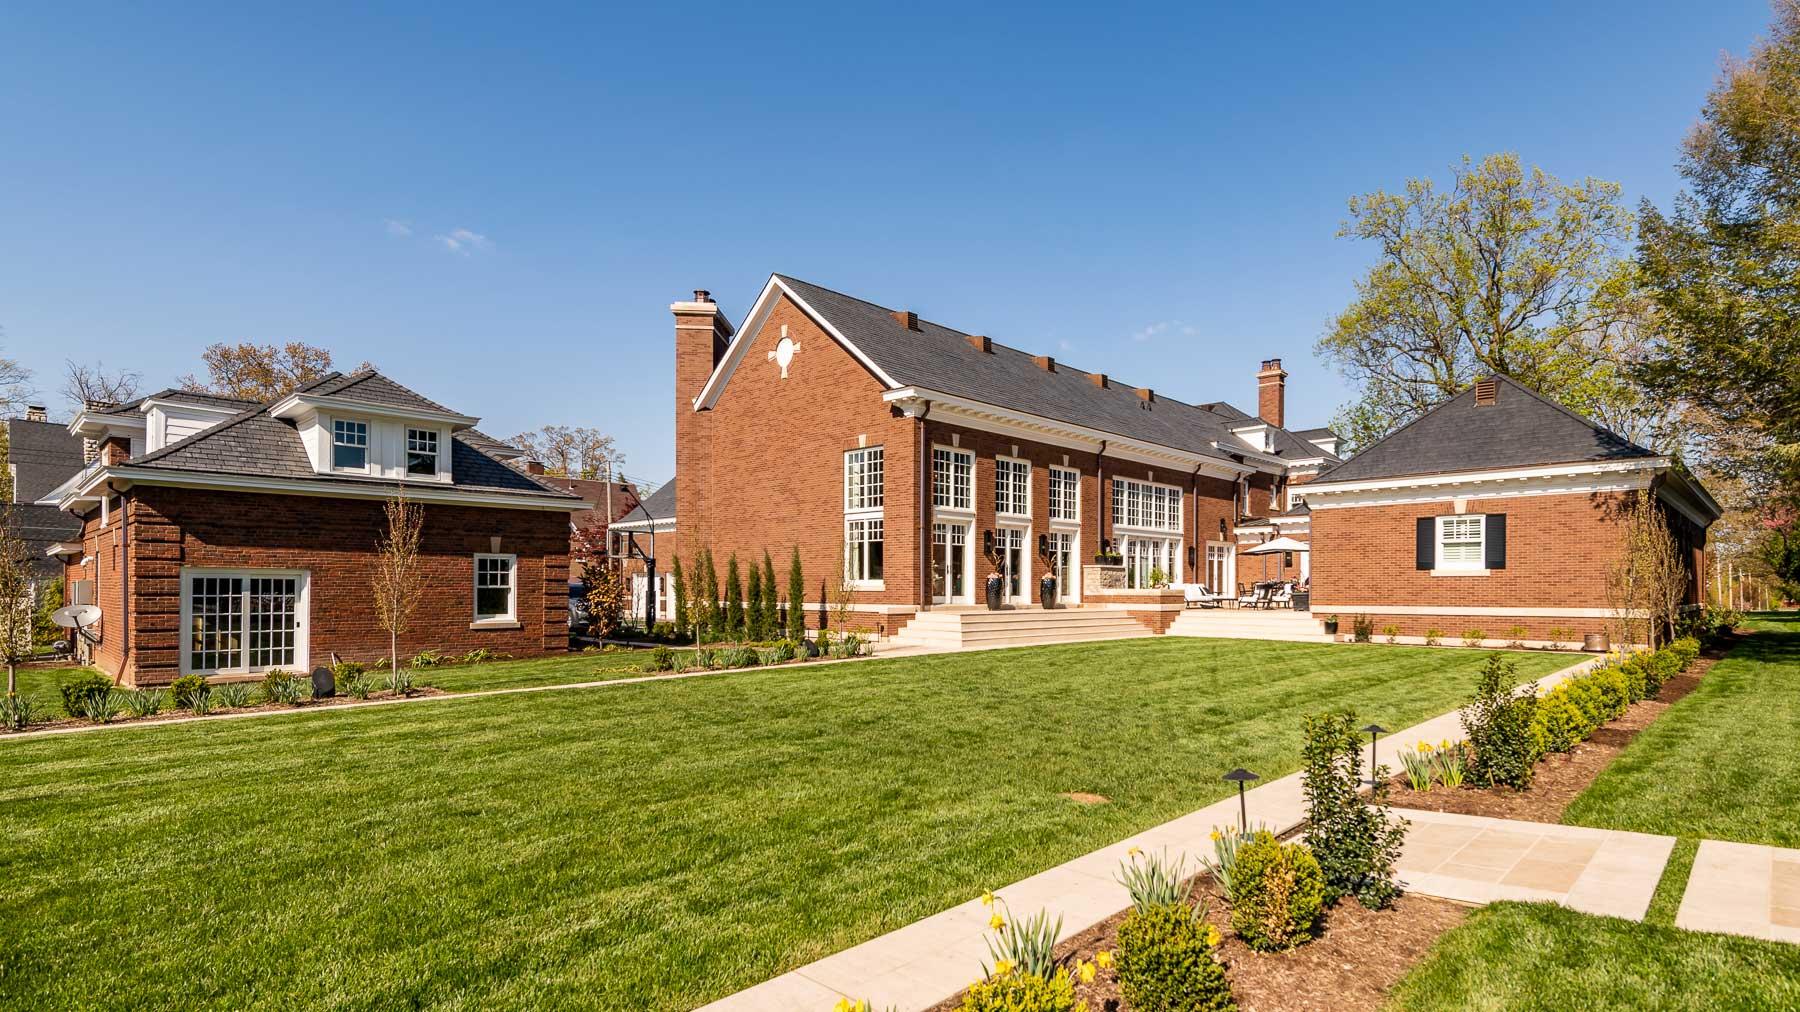 Schaub-Projects-Architecture-Quincy-Illinois-Historic-Preservation-114-web